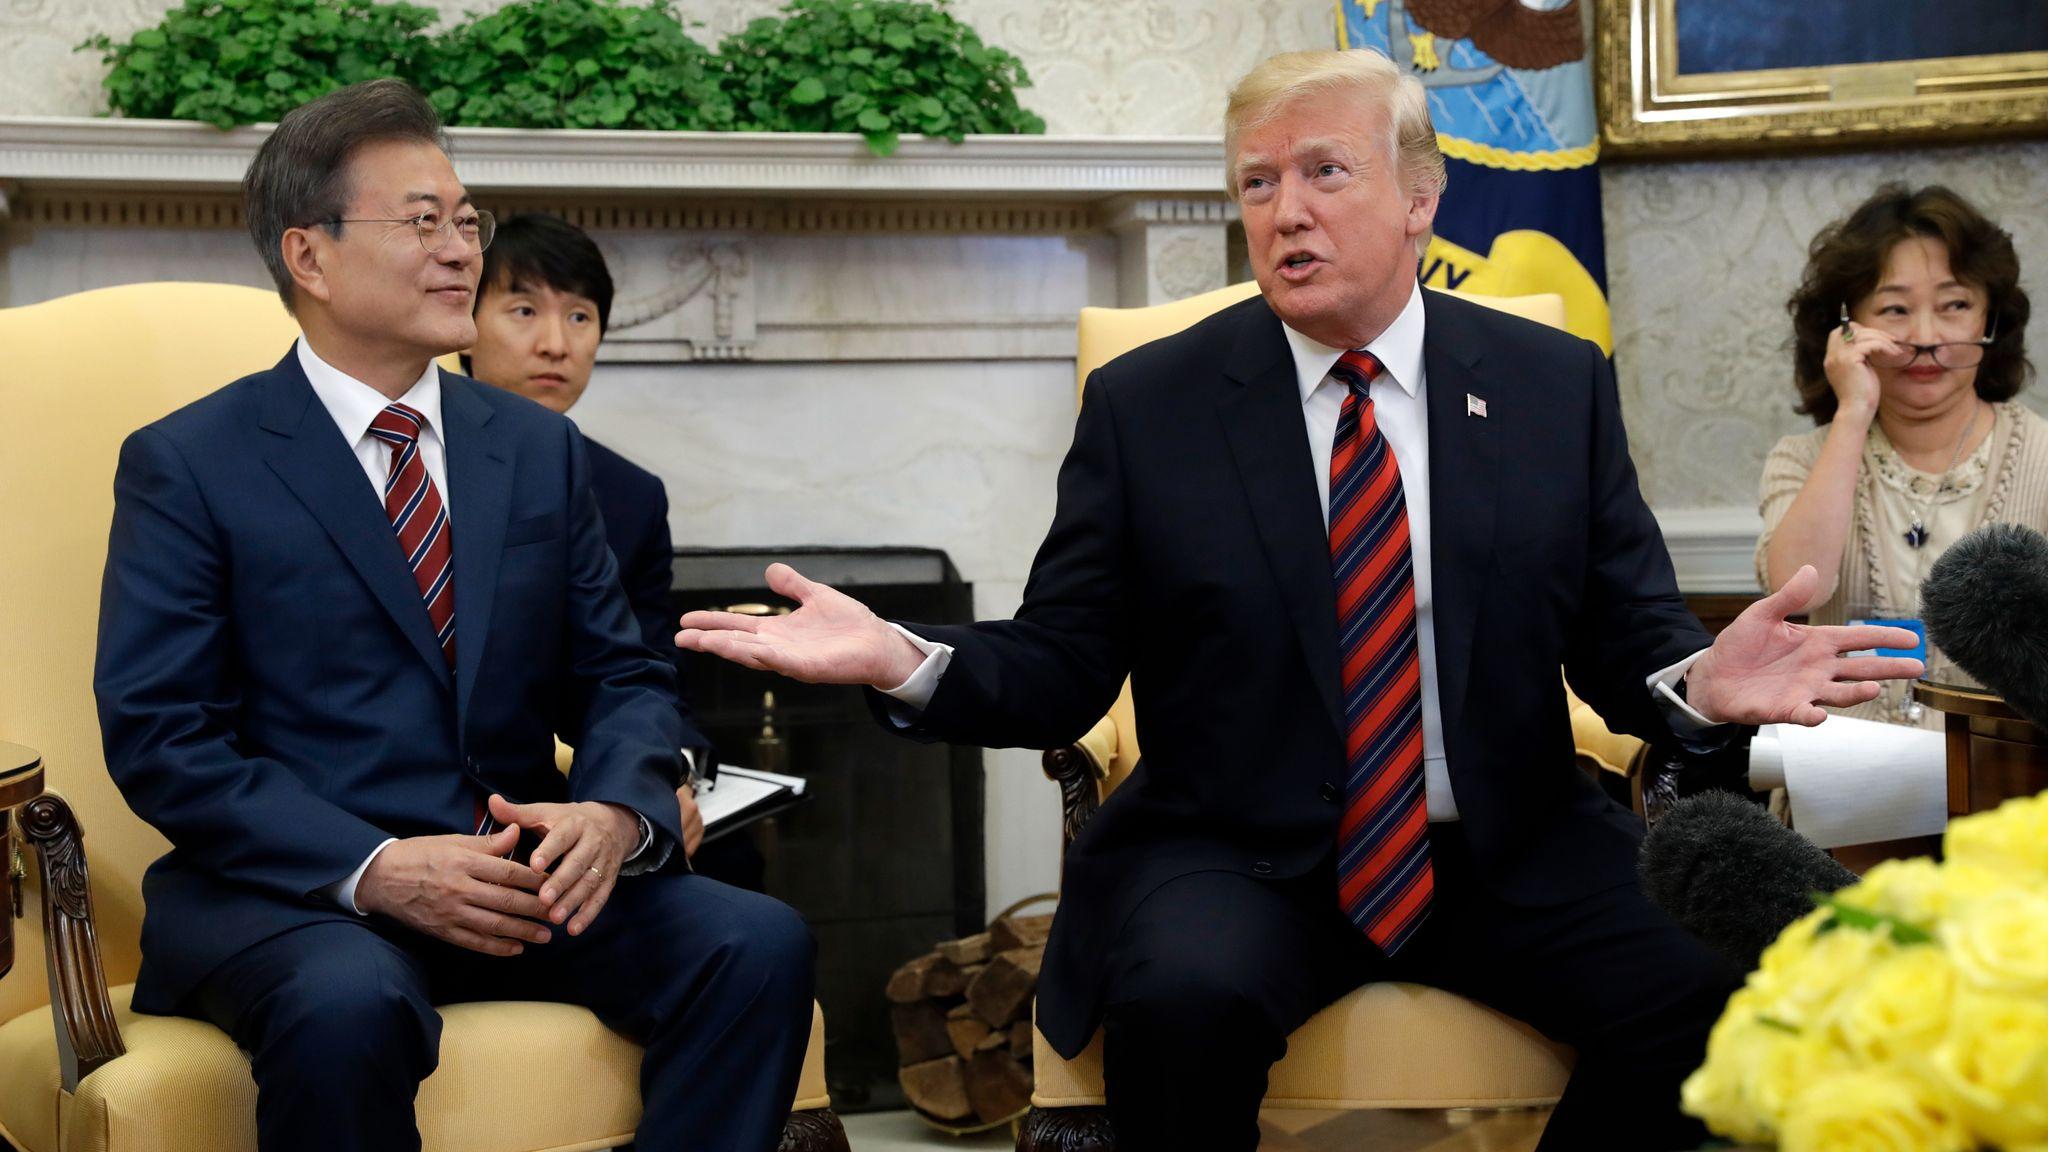 65fe7ceff Trump: Toppmøtet med Kim Jong-un kan bli utsatt - Stavanger Aftenblad